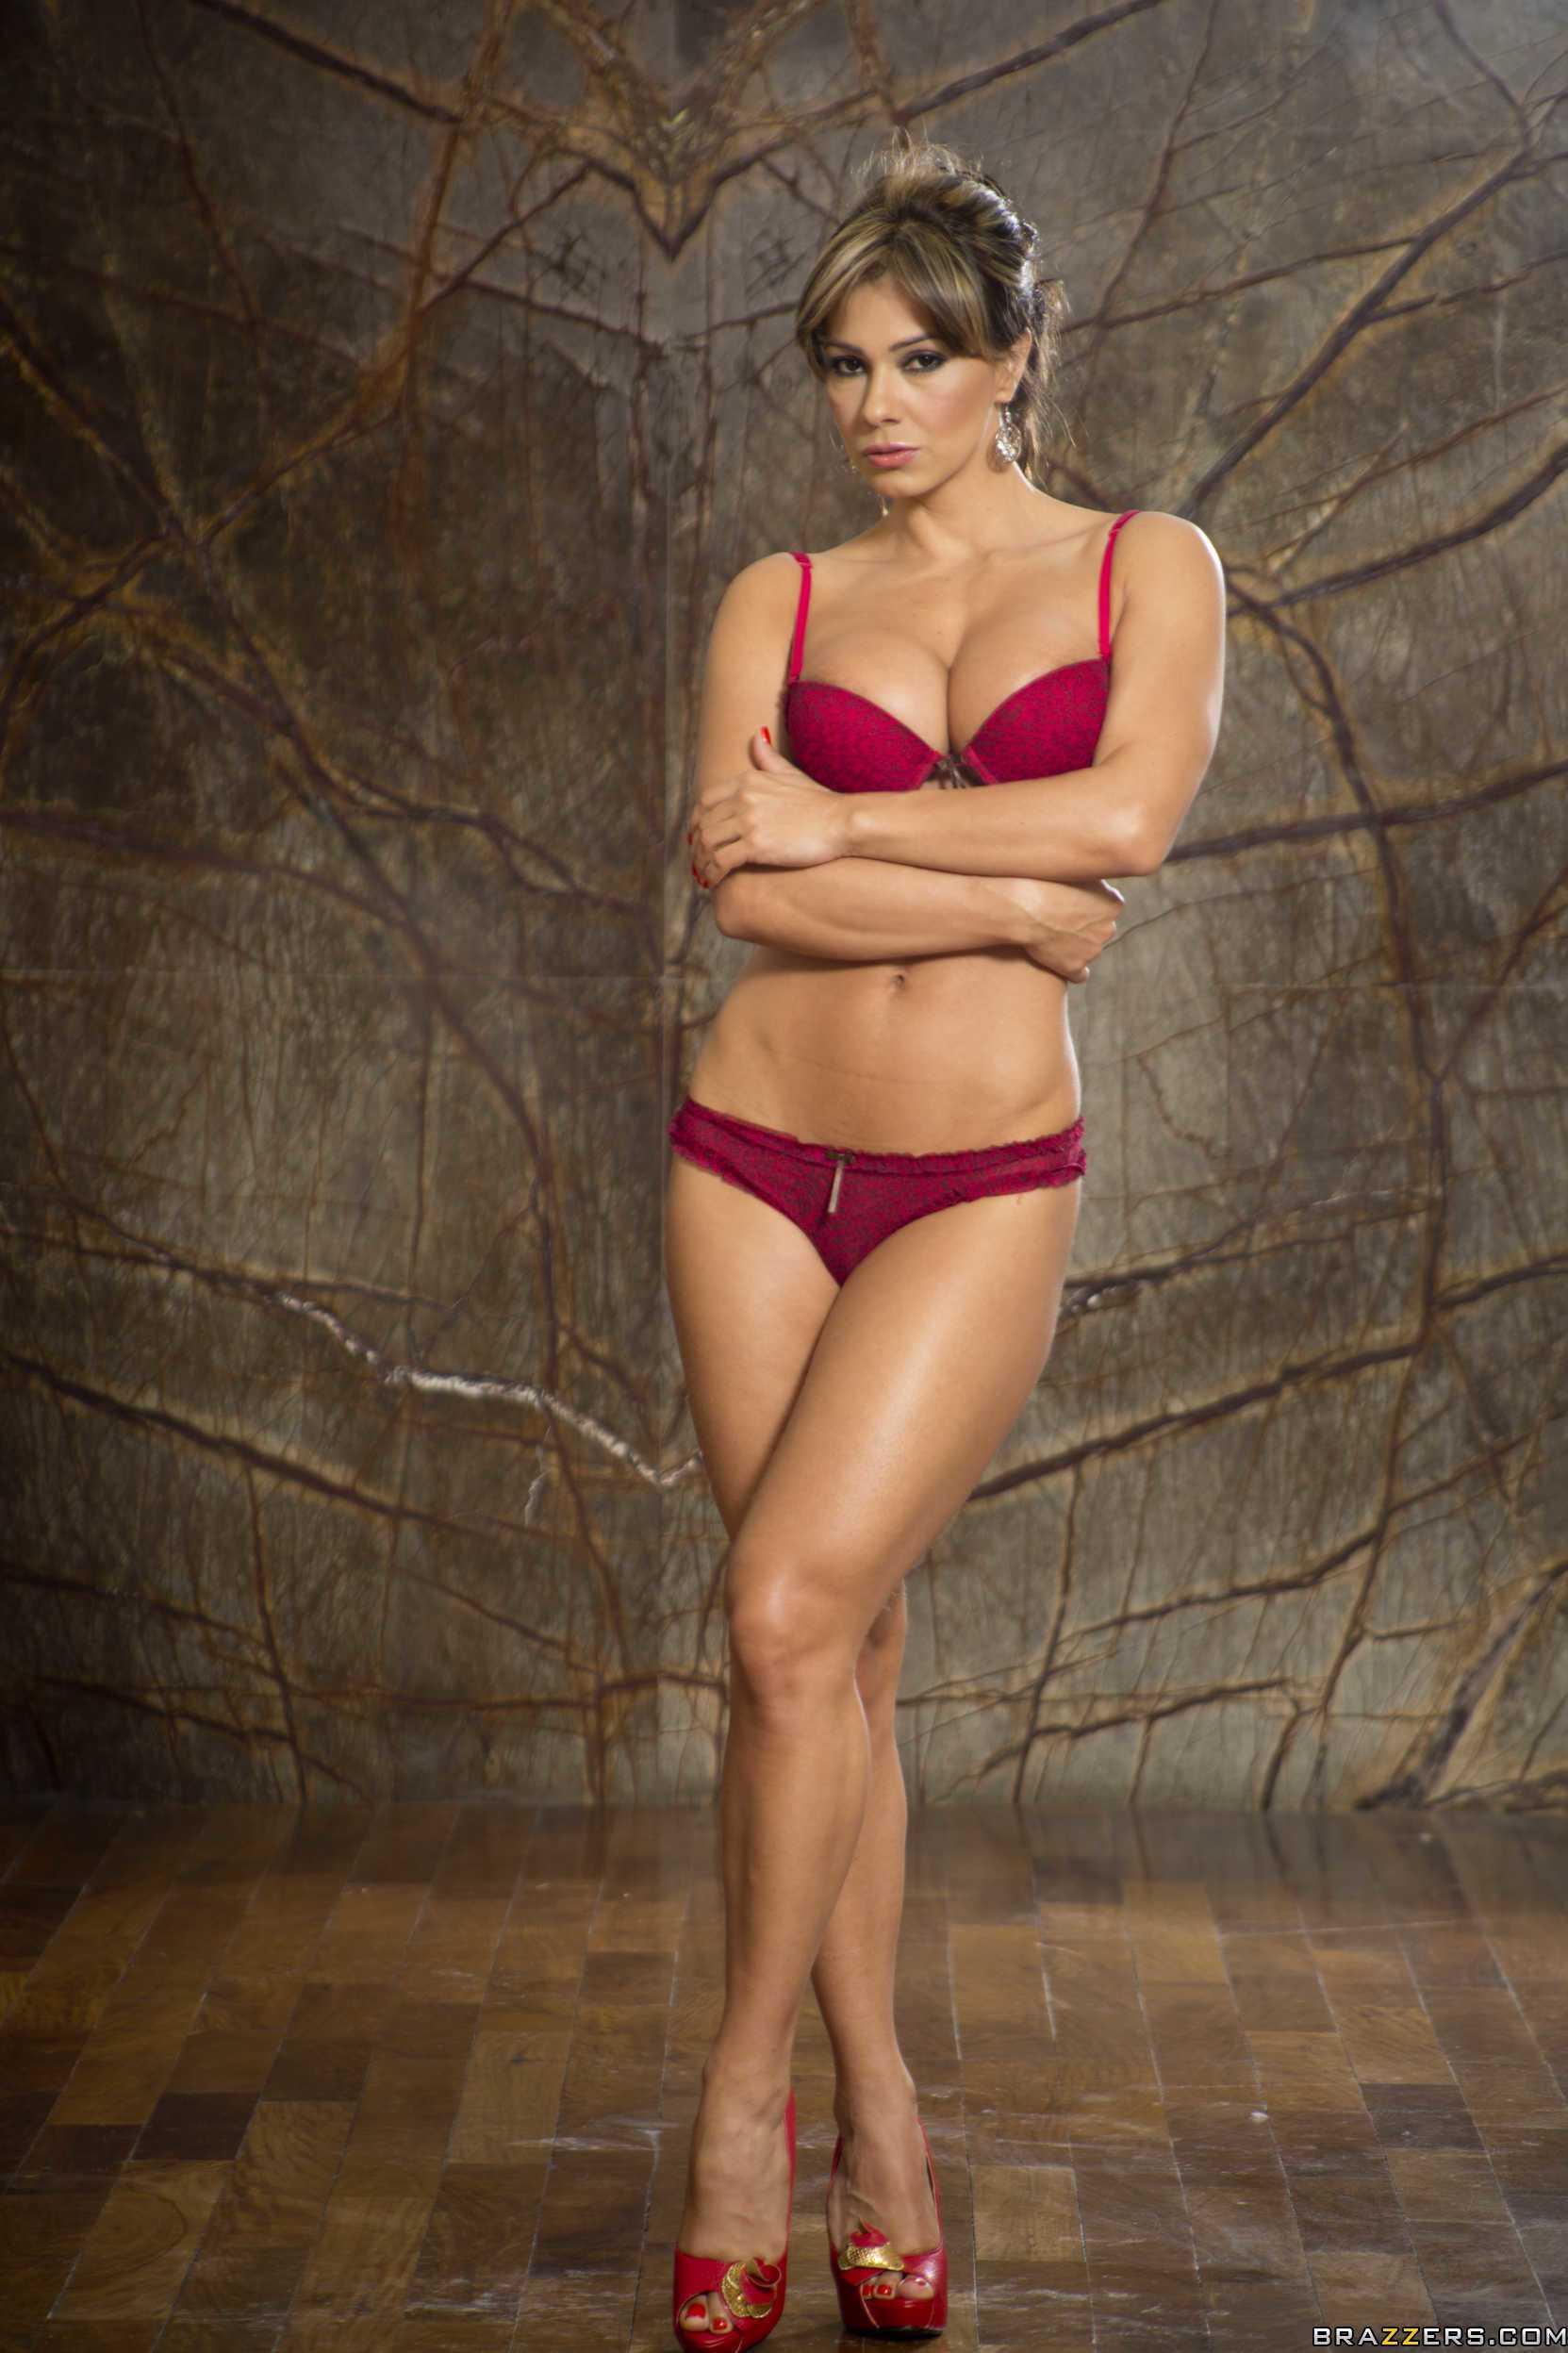 Esperanza Gomez cleavage